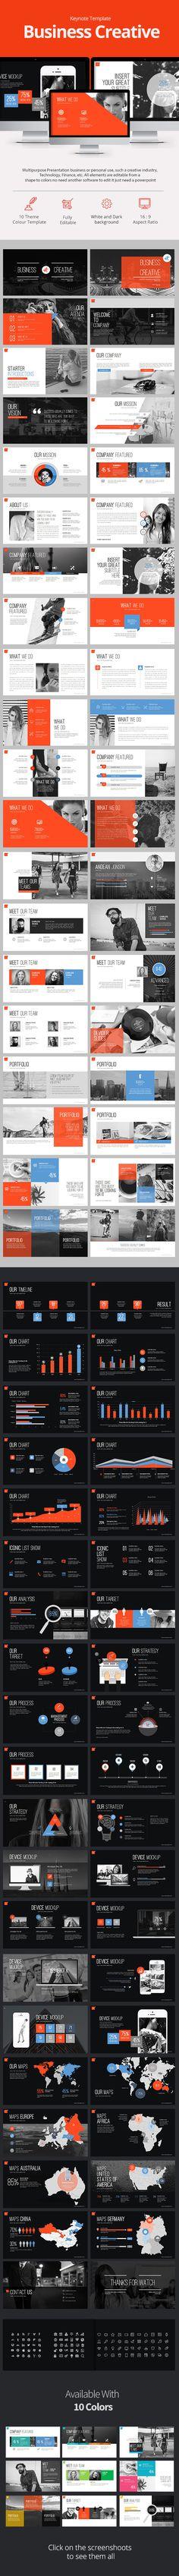 Business #Creative #Keynote #Templates - Keynote Templates Presentation Templates Download here: https://graphicriver.net/item/business-creative-keynote-templates/20292236?ref=alena994